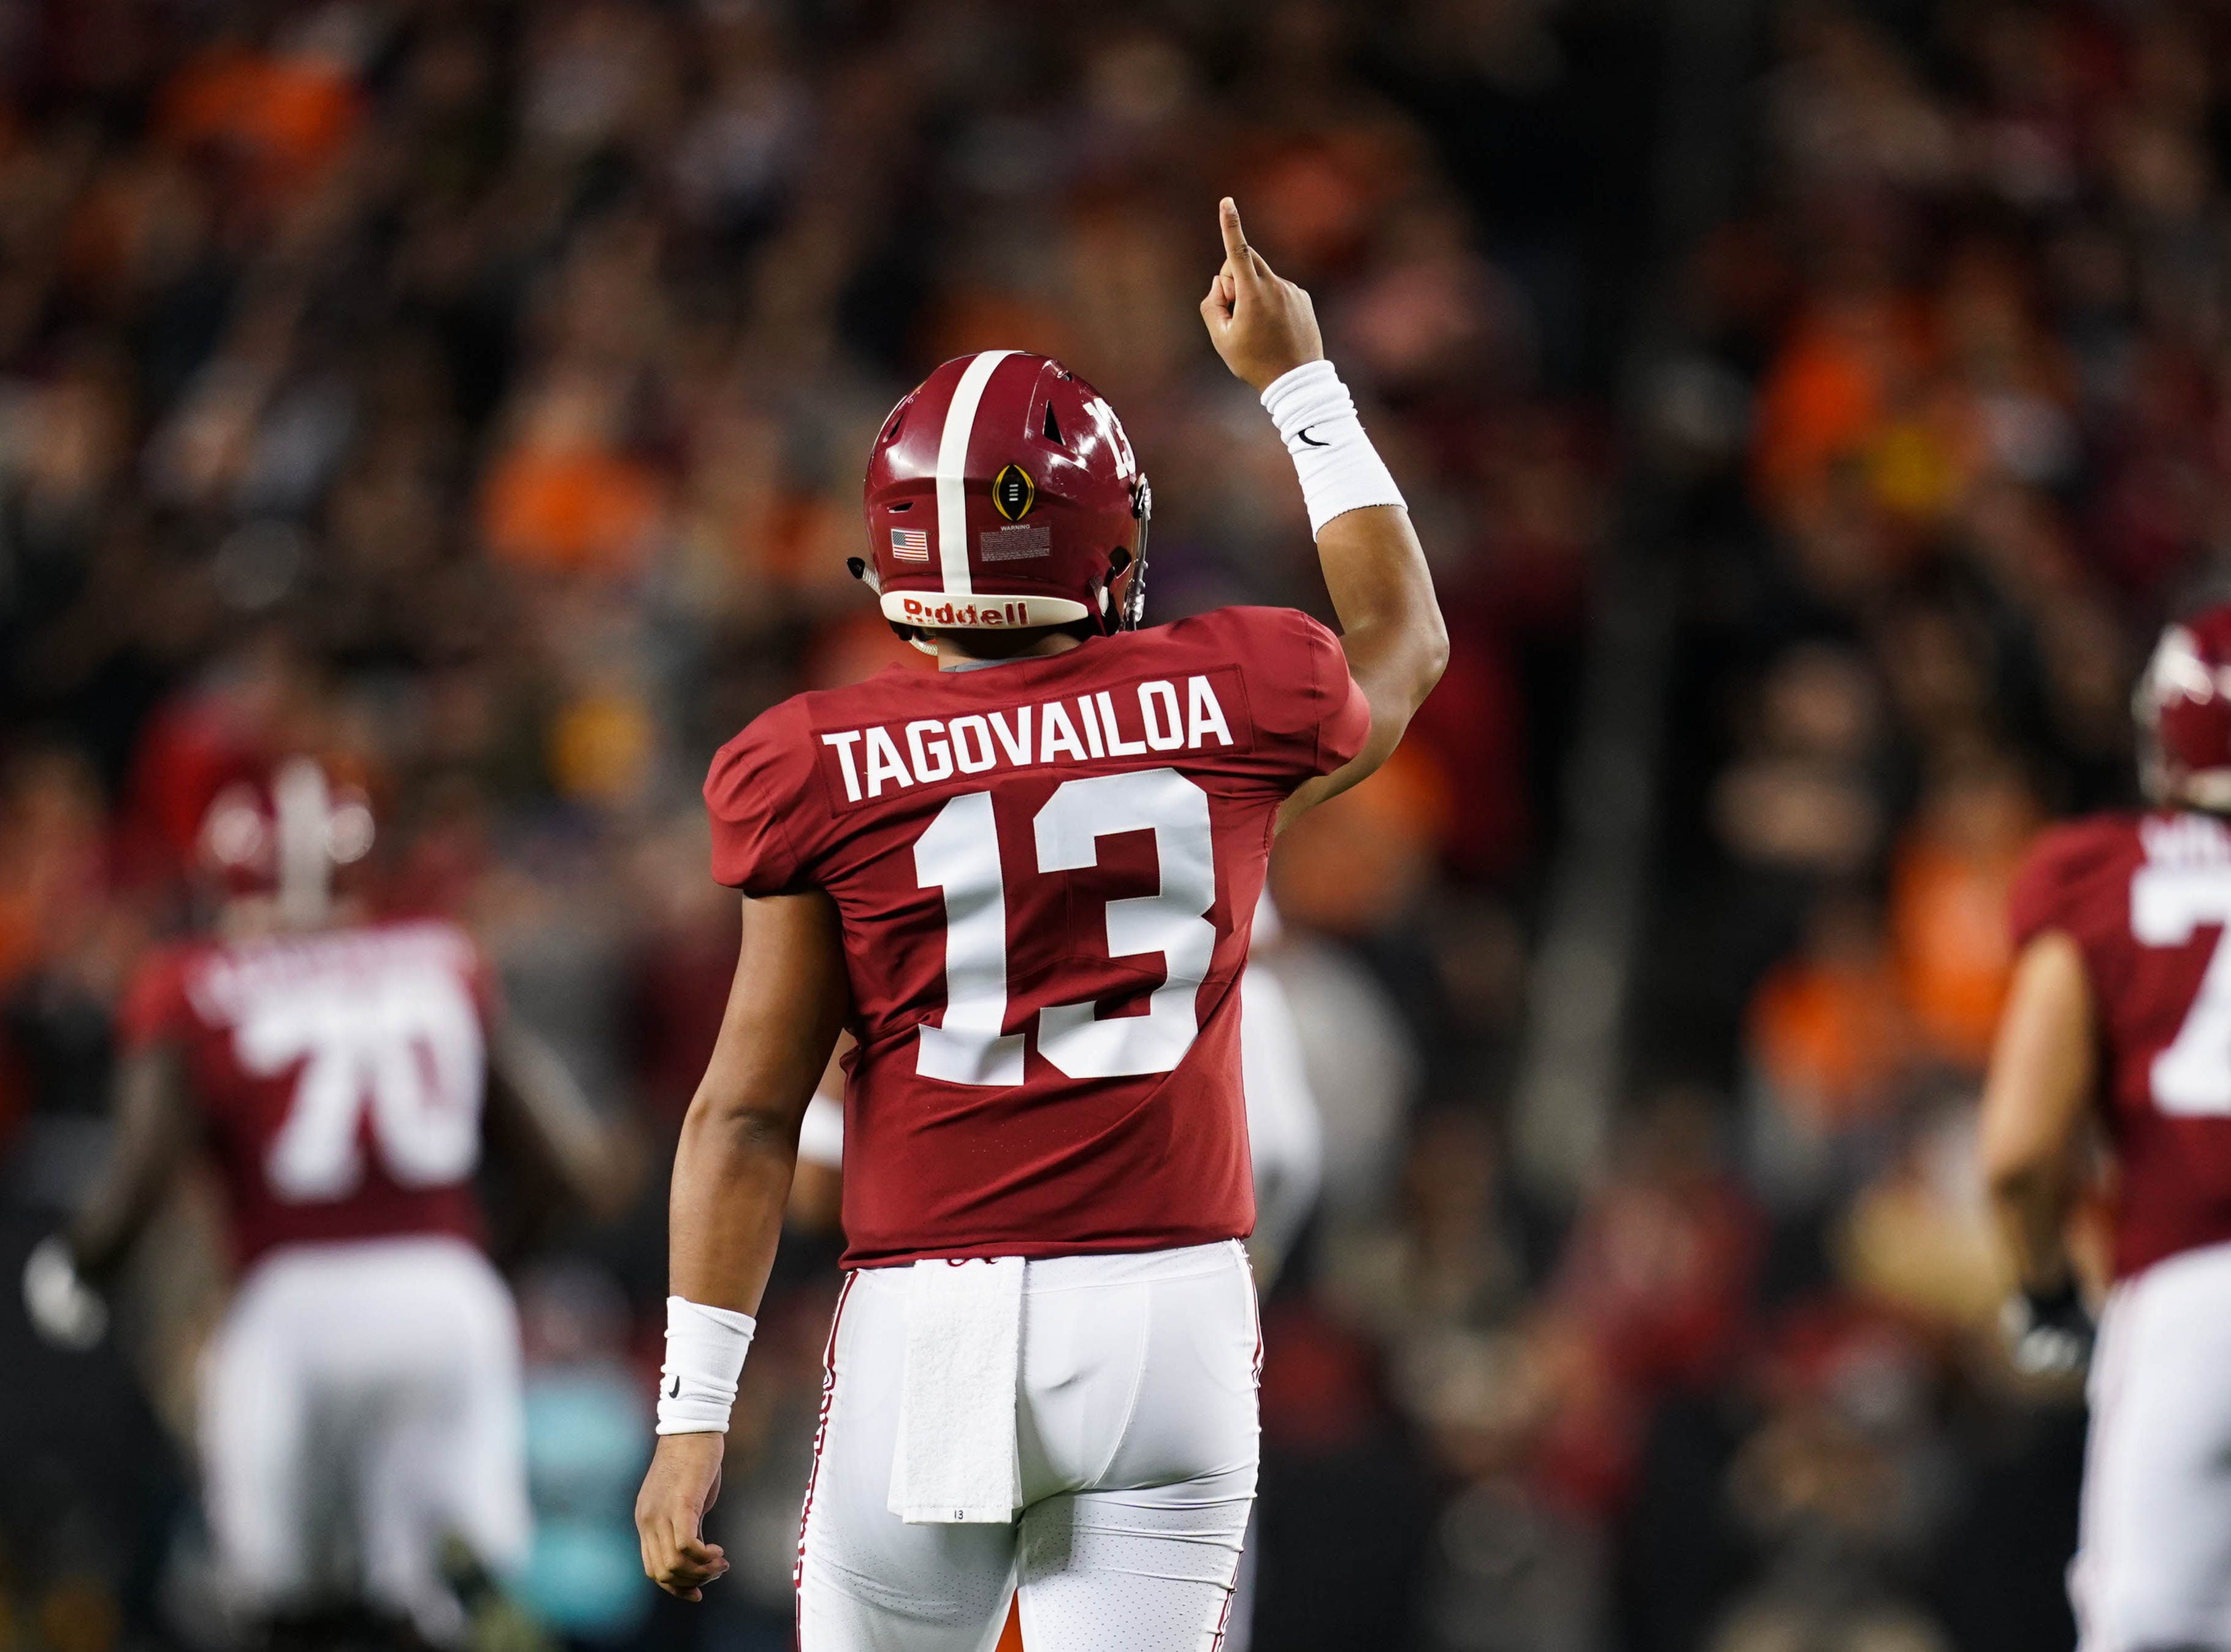 Alabama quarterback Tua Tagovailoa celebrates during the first quarter.